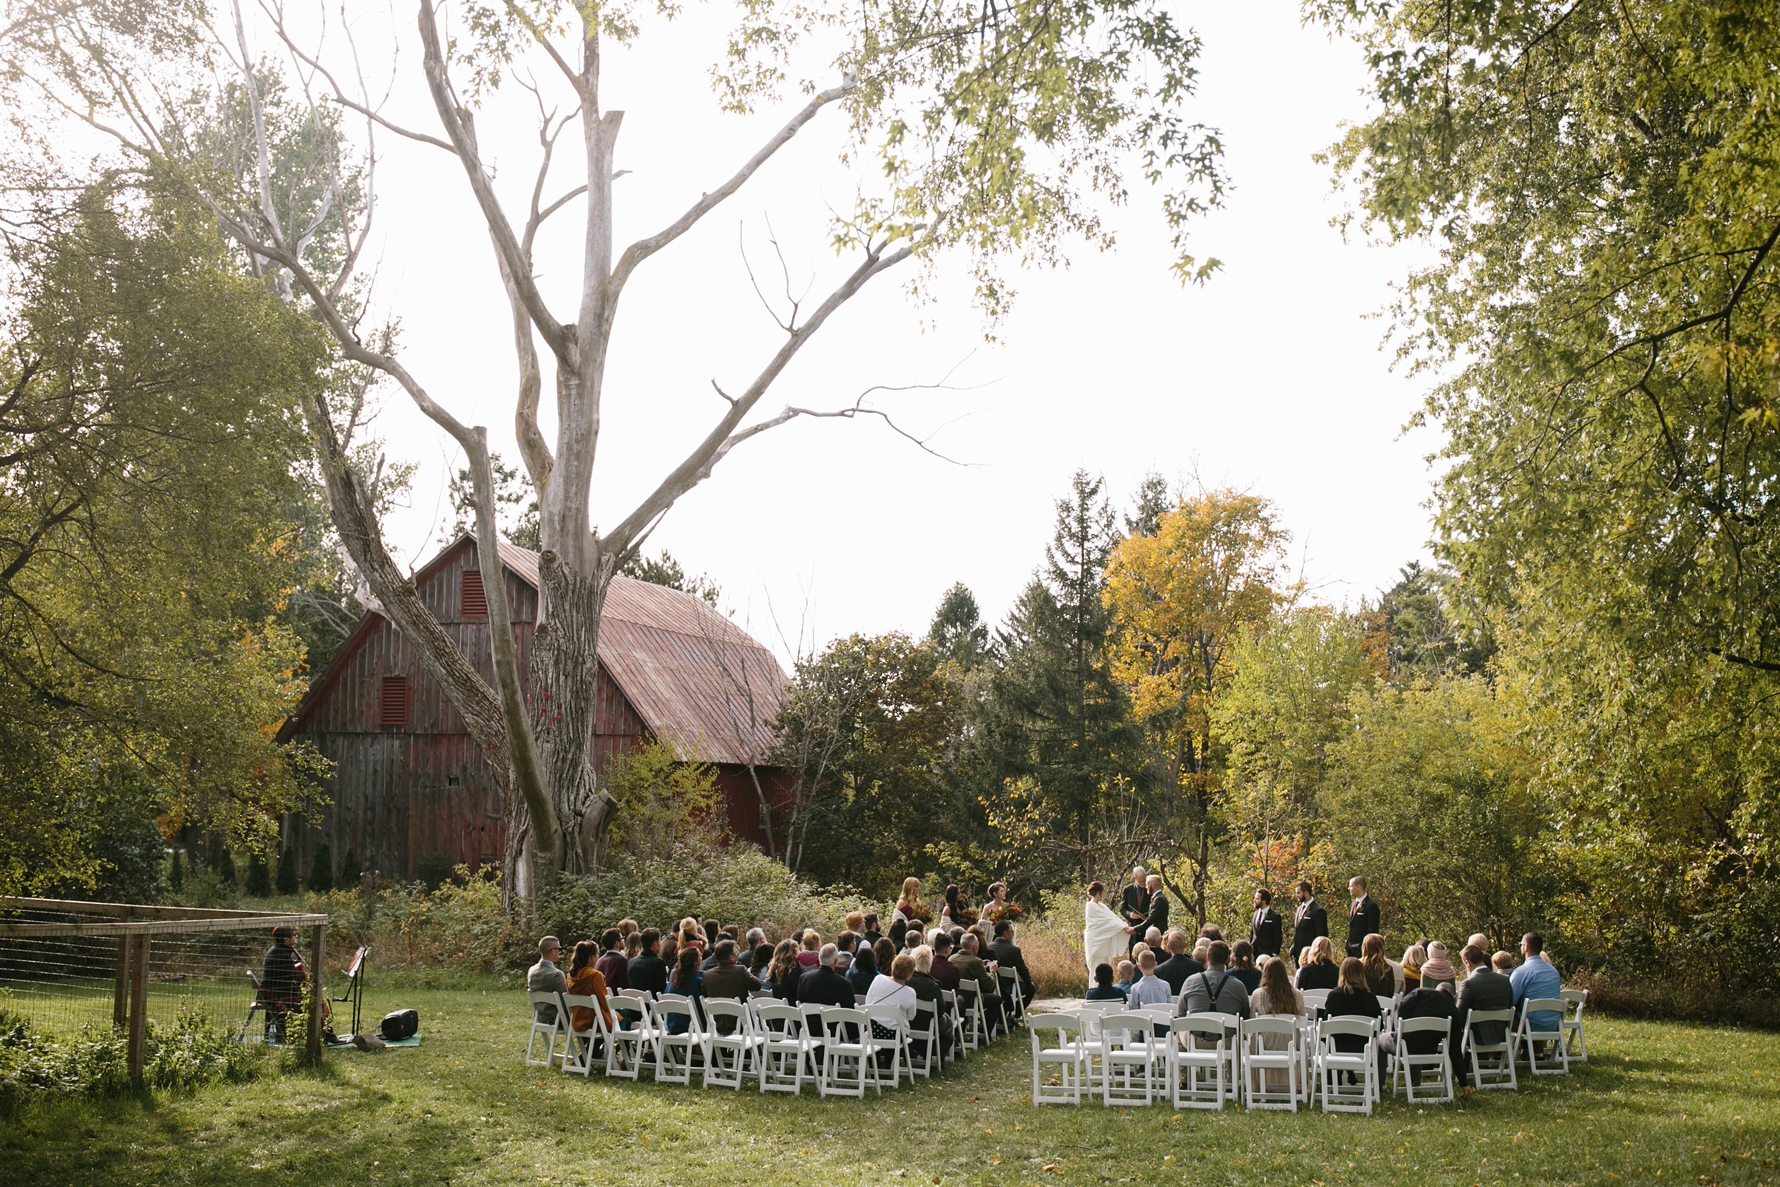 norris-traverse-city-wedding-45.JPG